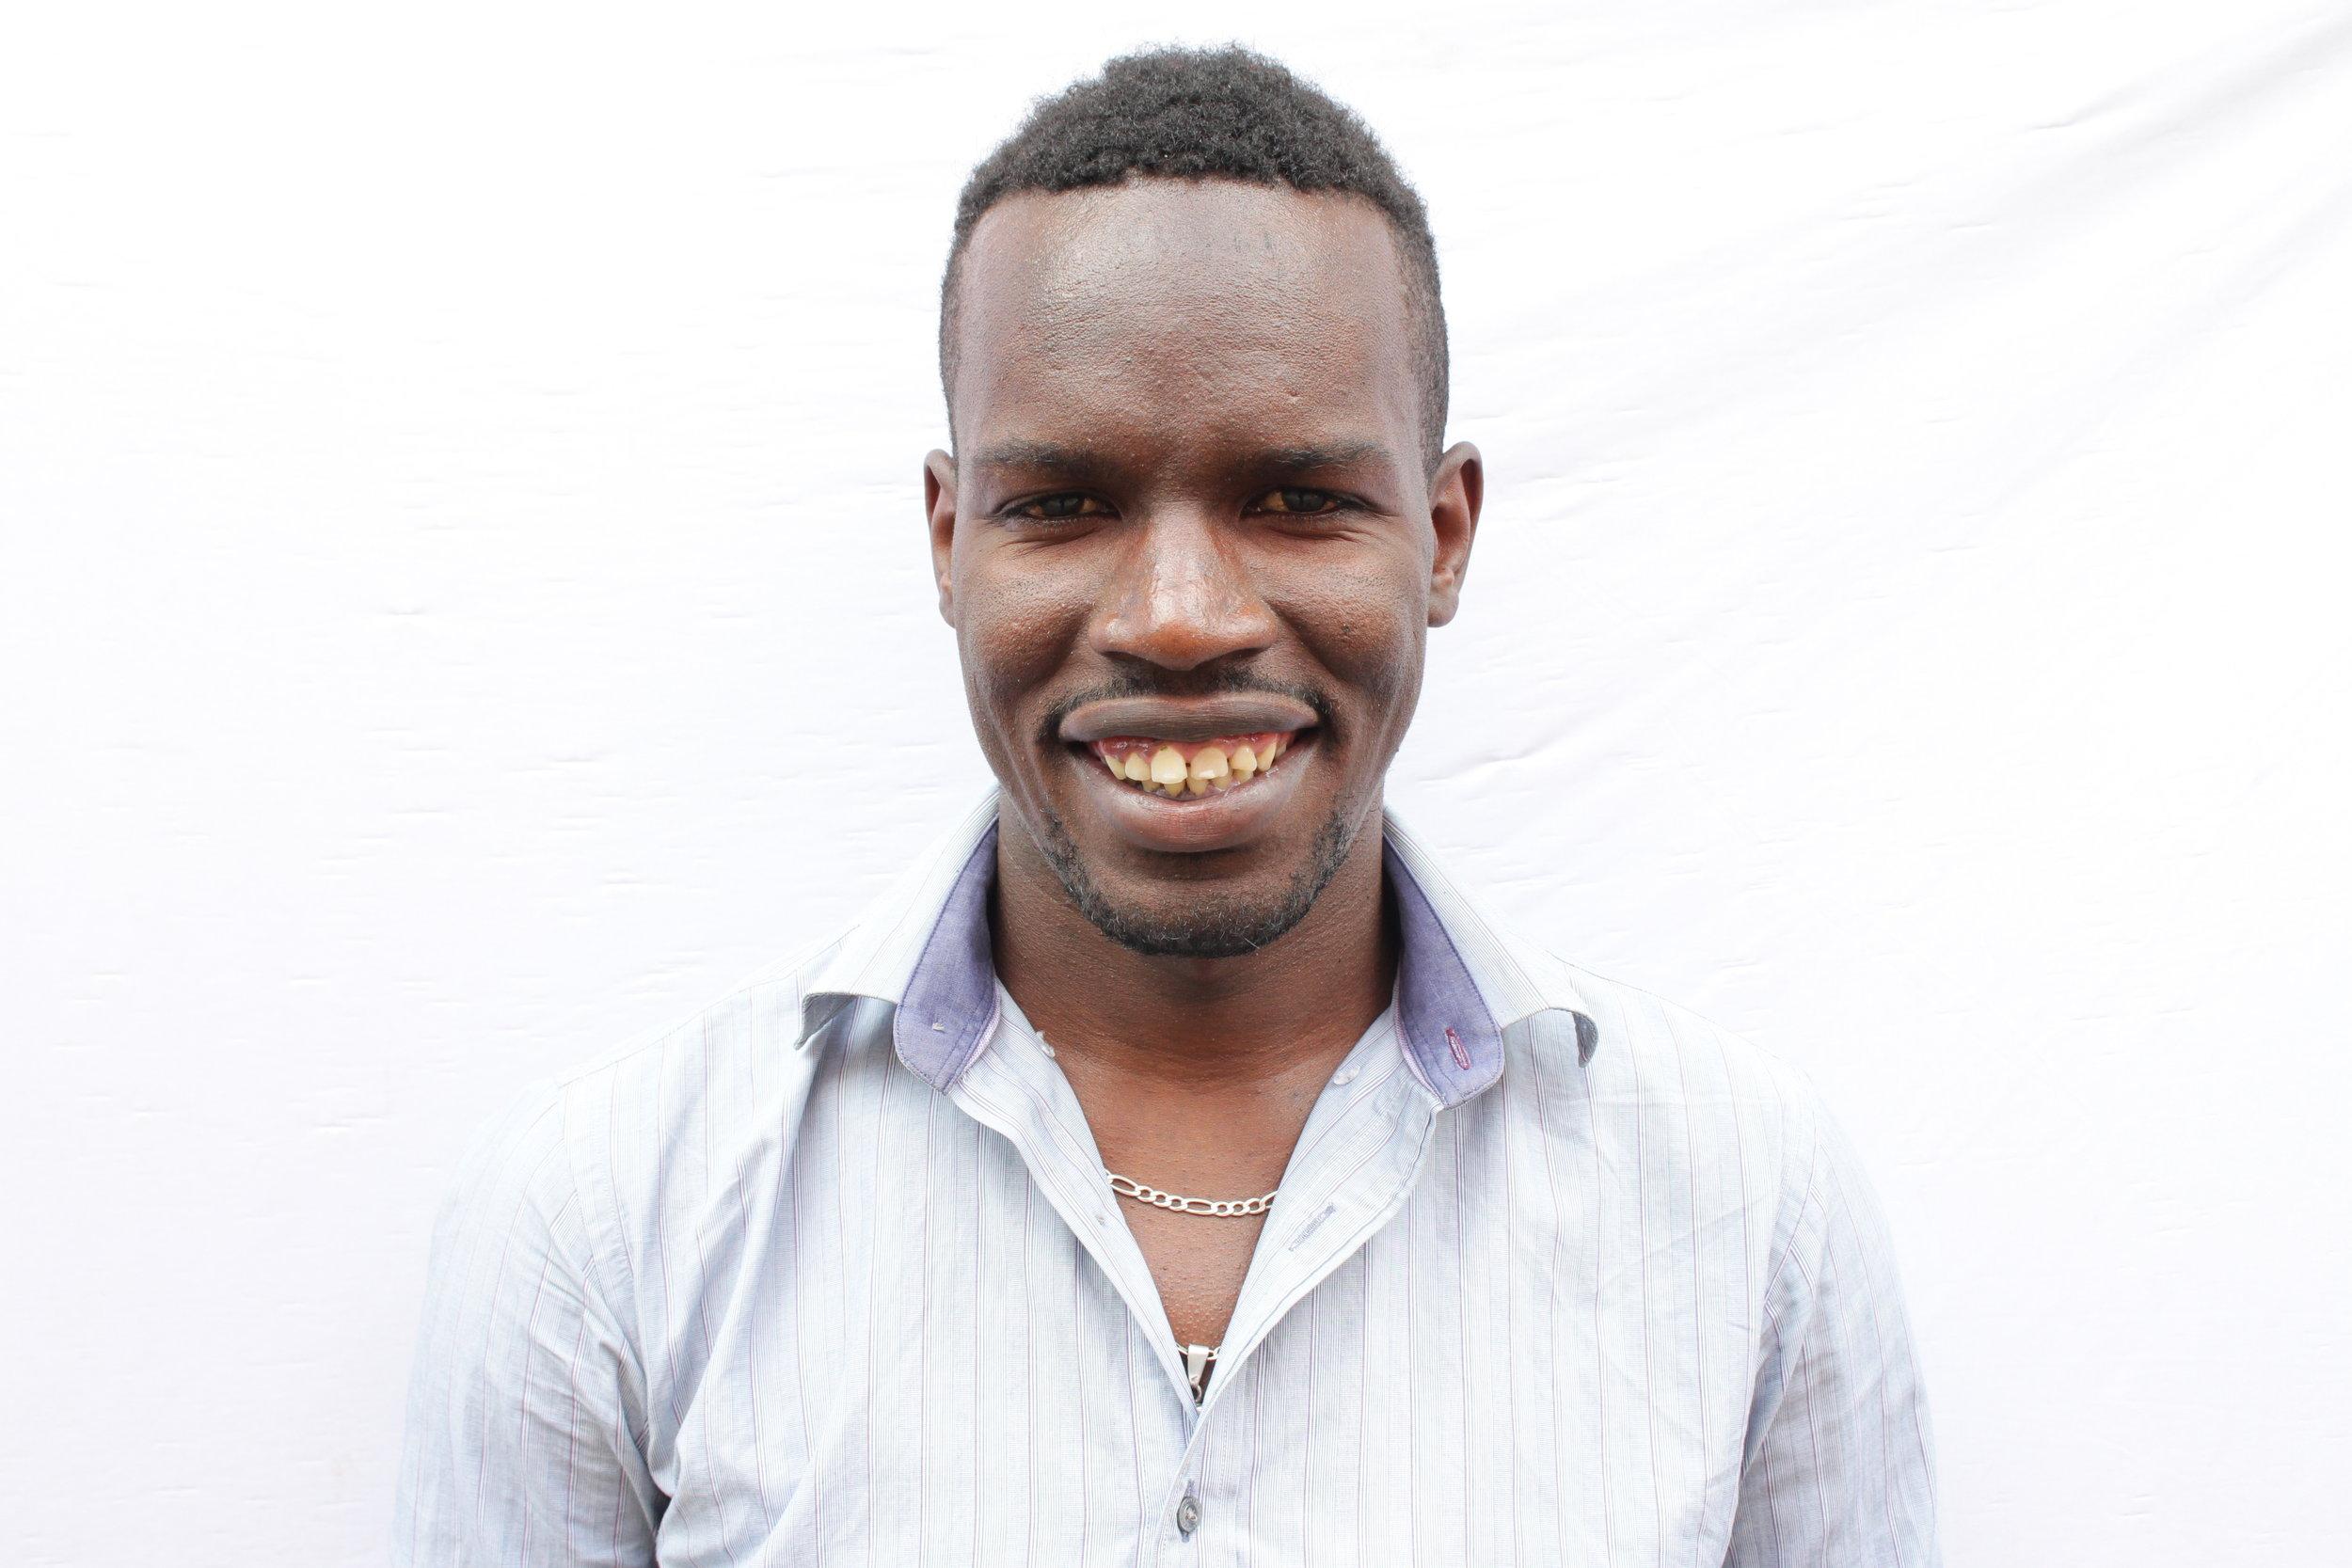 Kevin-Ciira-Mukuru-Instructor.JPG